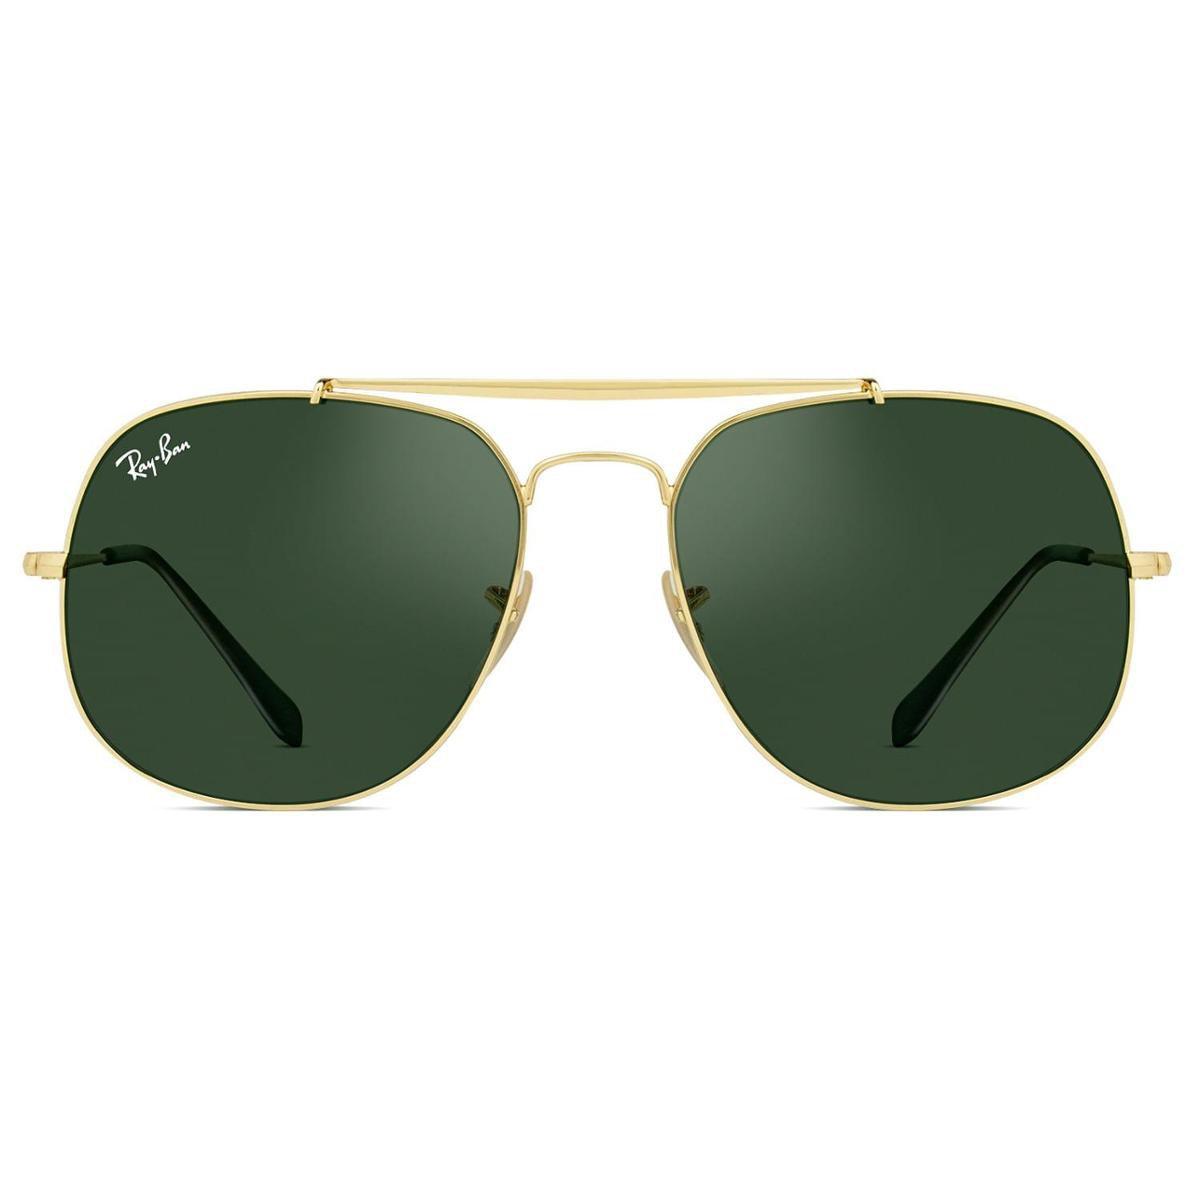 Óculos Ray Ban The General RB3561 001-57 - Compre Agora   Netshoes 3c1487c3c1